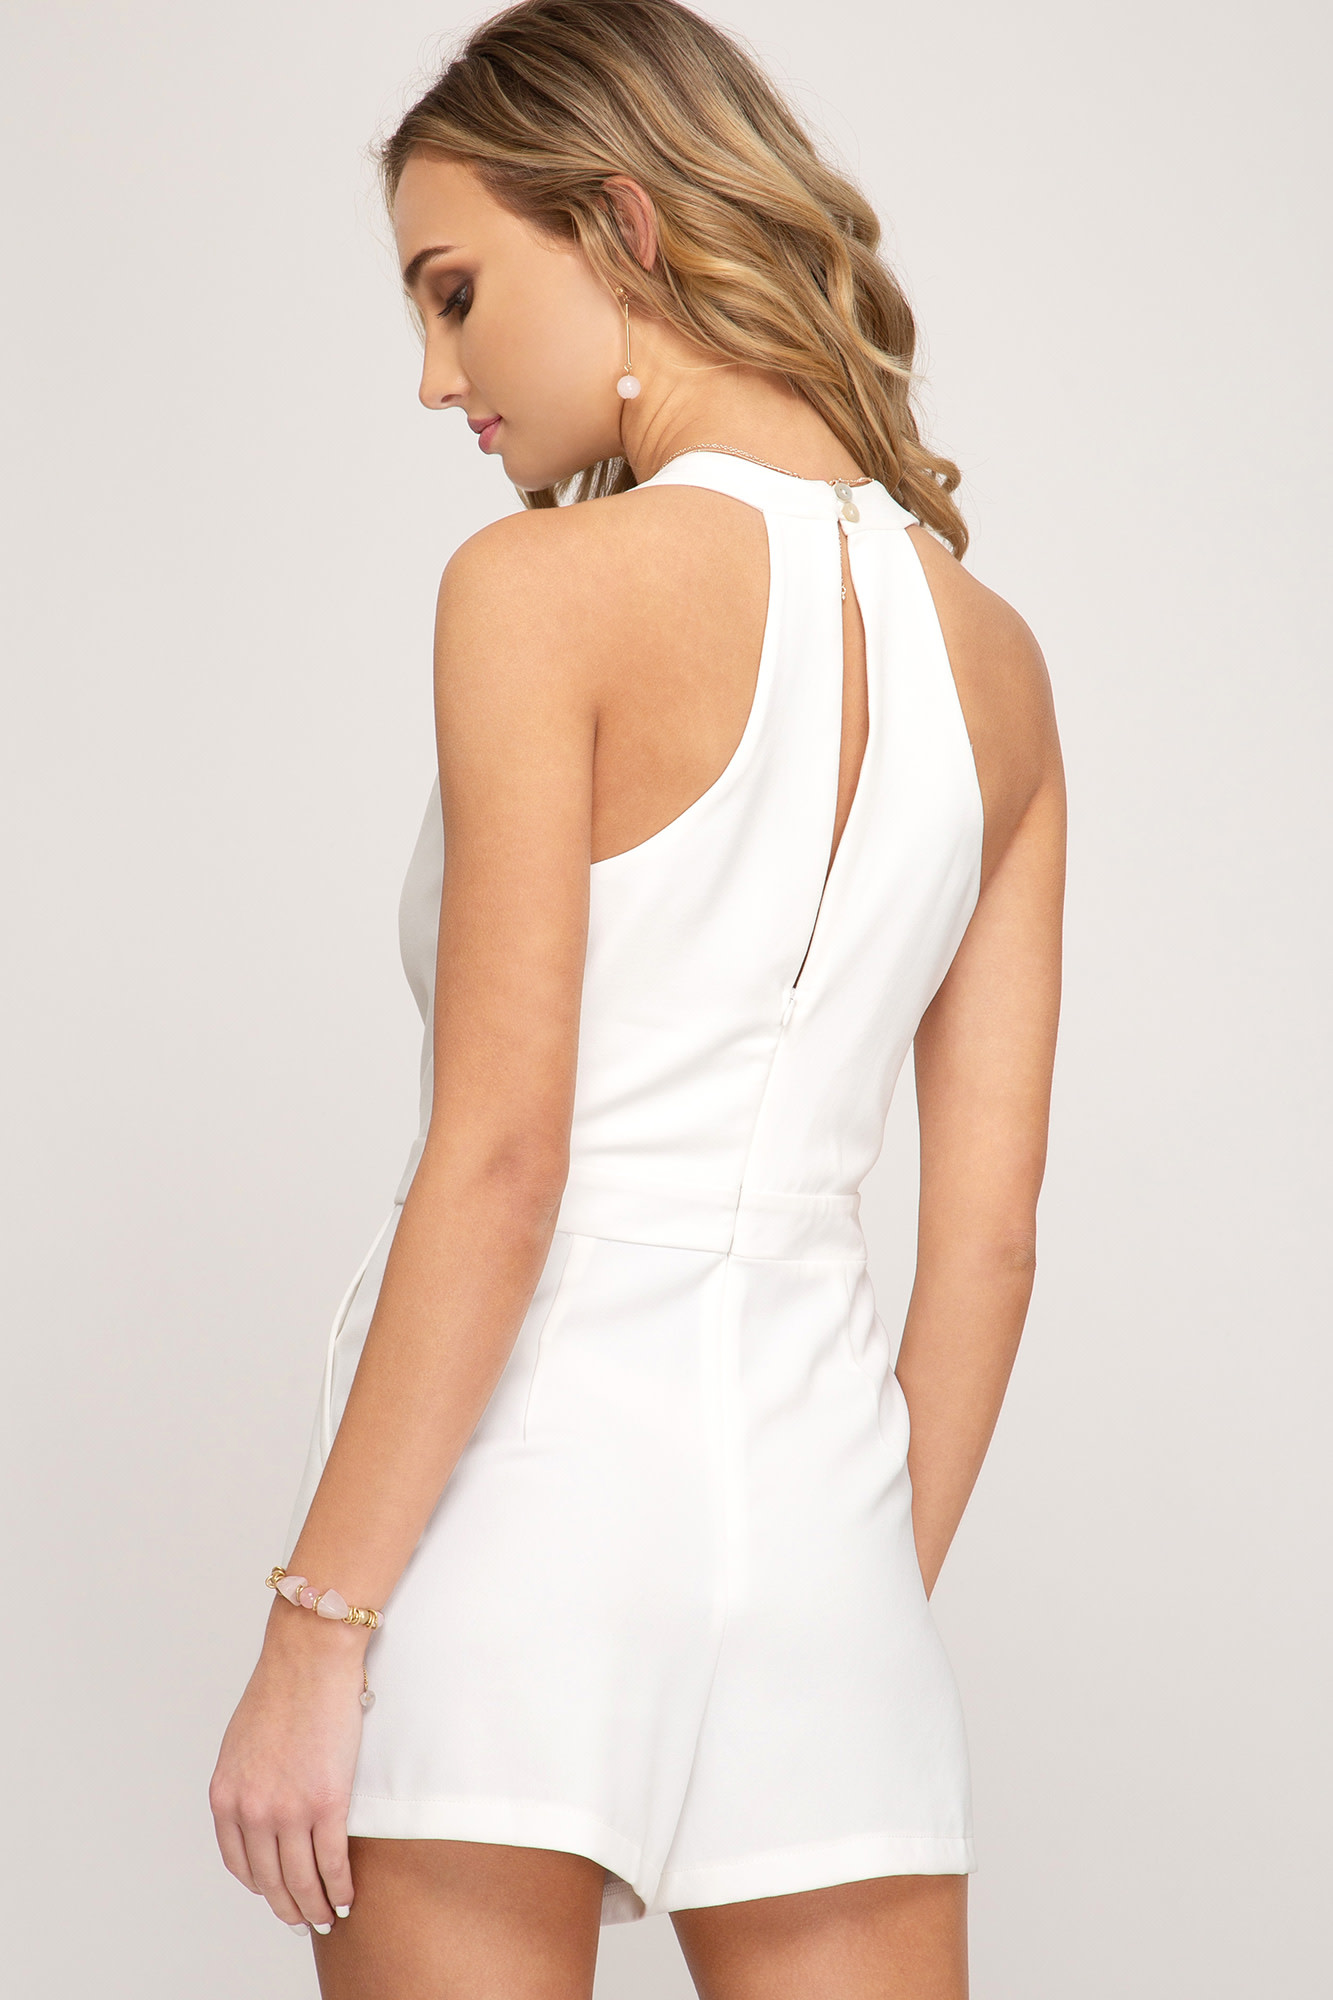 White sleeveless surplice romper